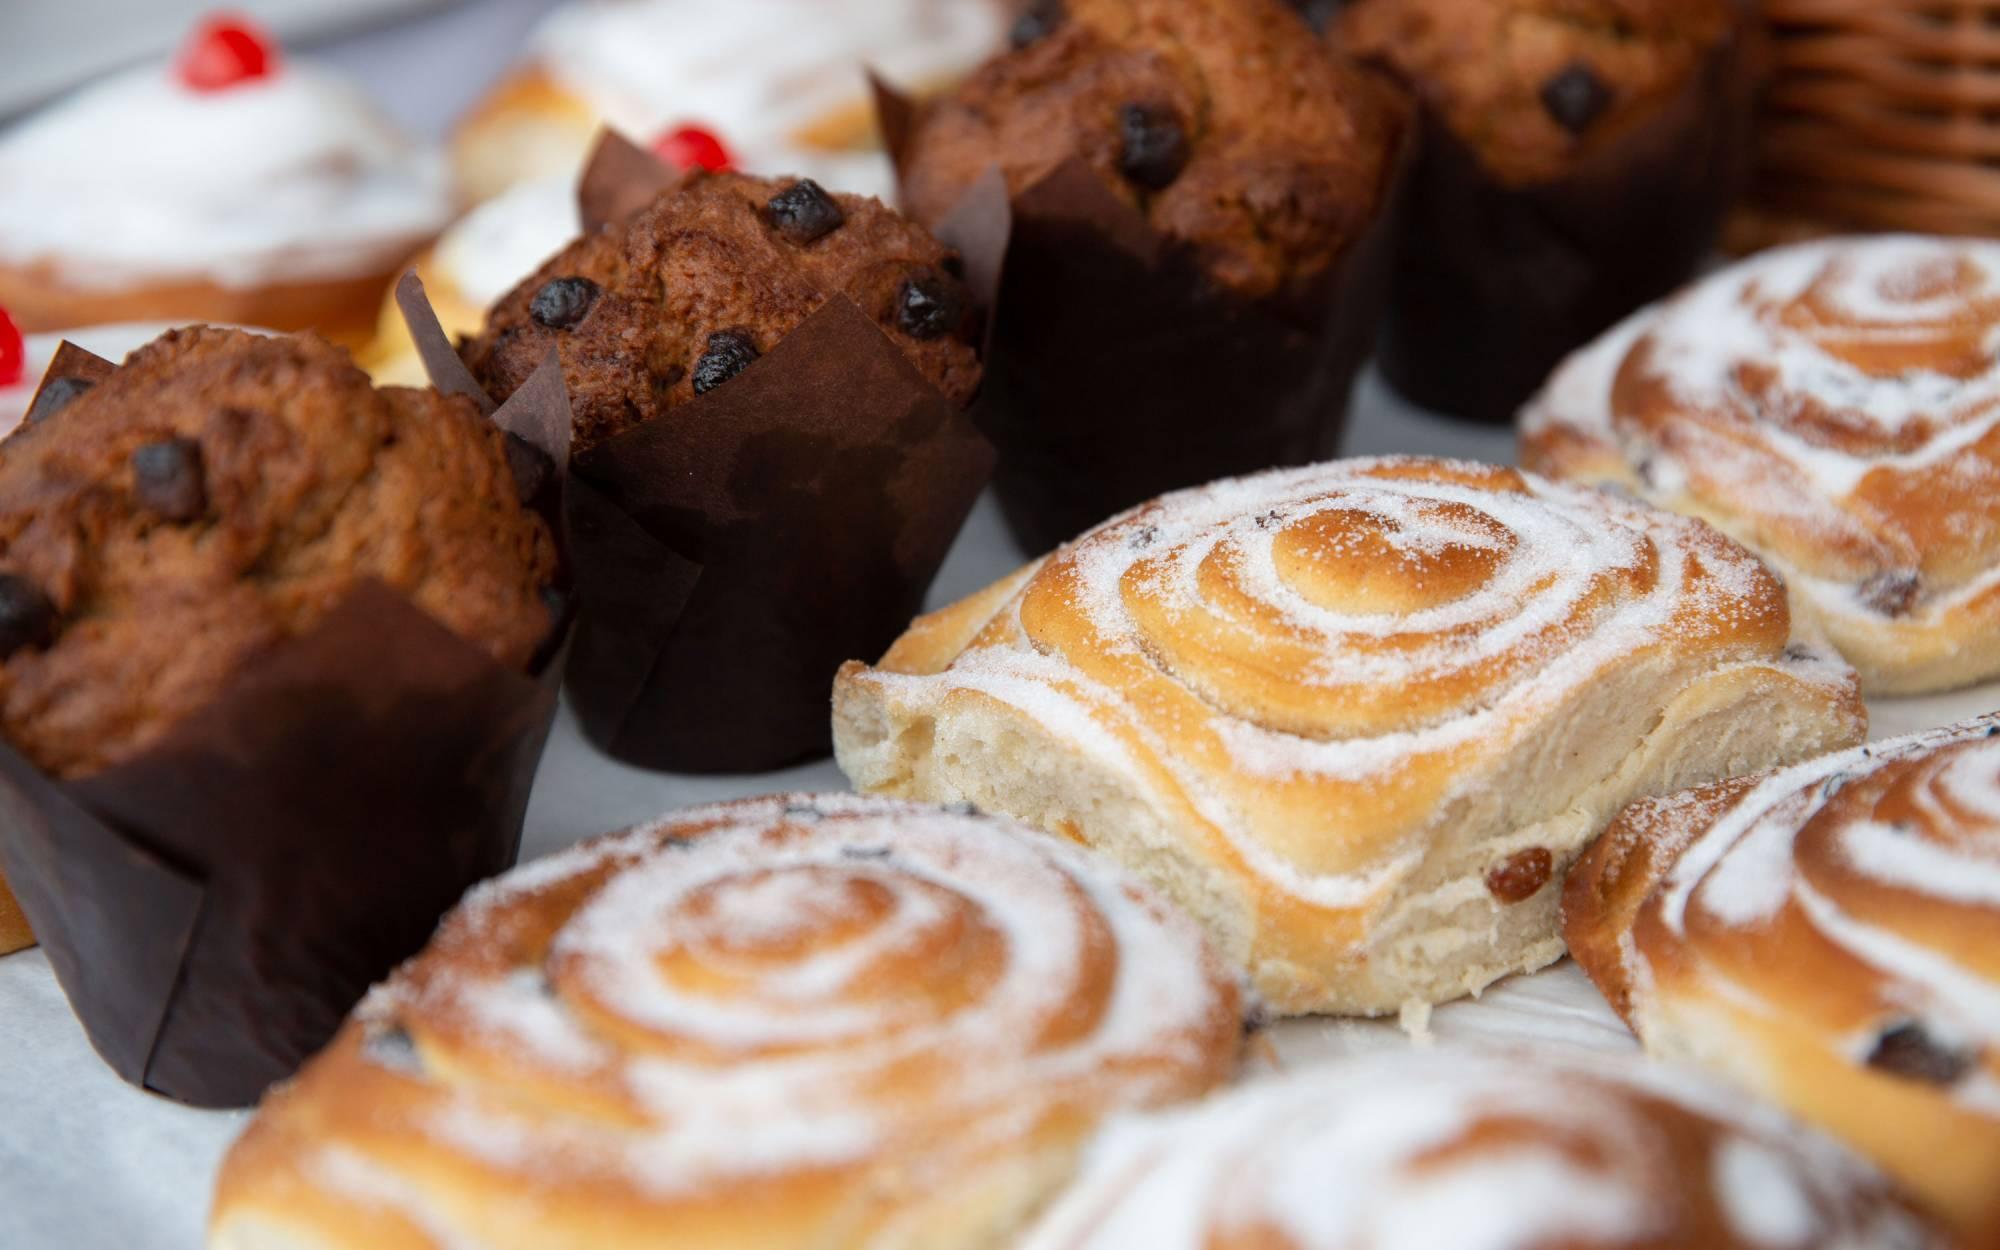 Pastries at the Artisan Food Market